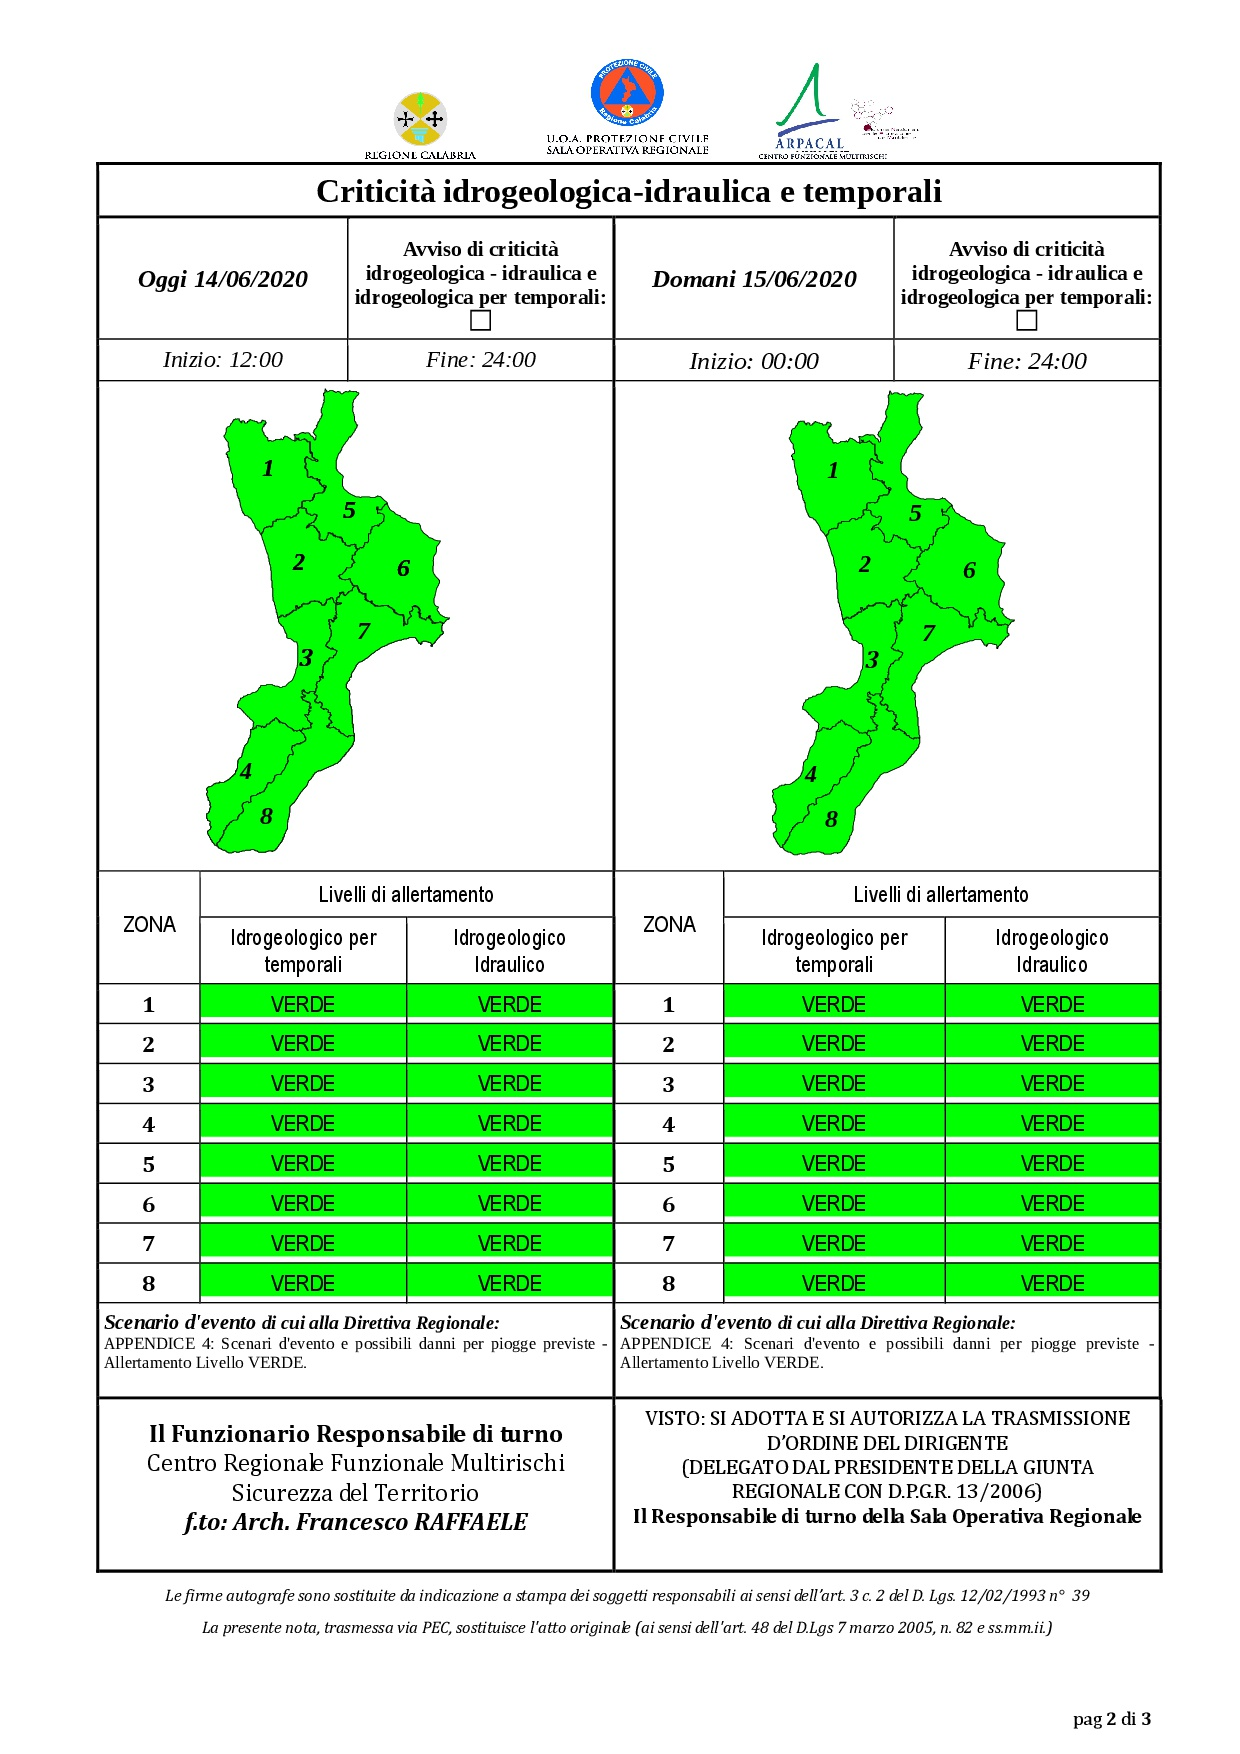 Criticità idrogeologica-idraulica e temporali in Calabria 14-06-2020